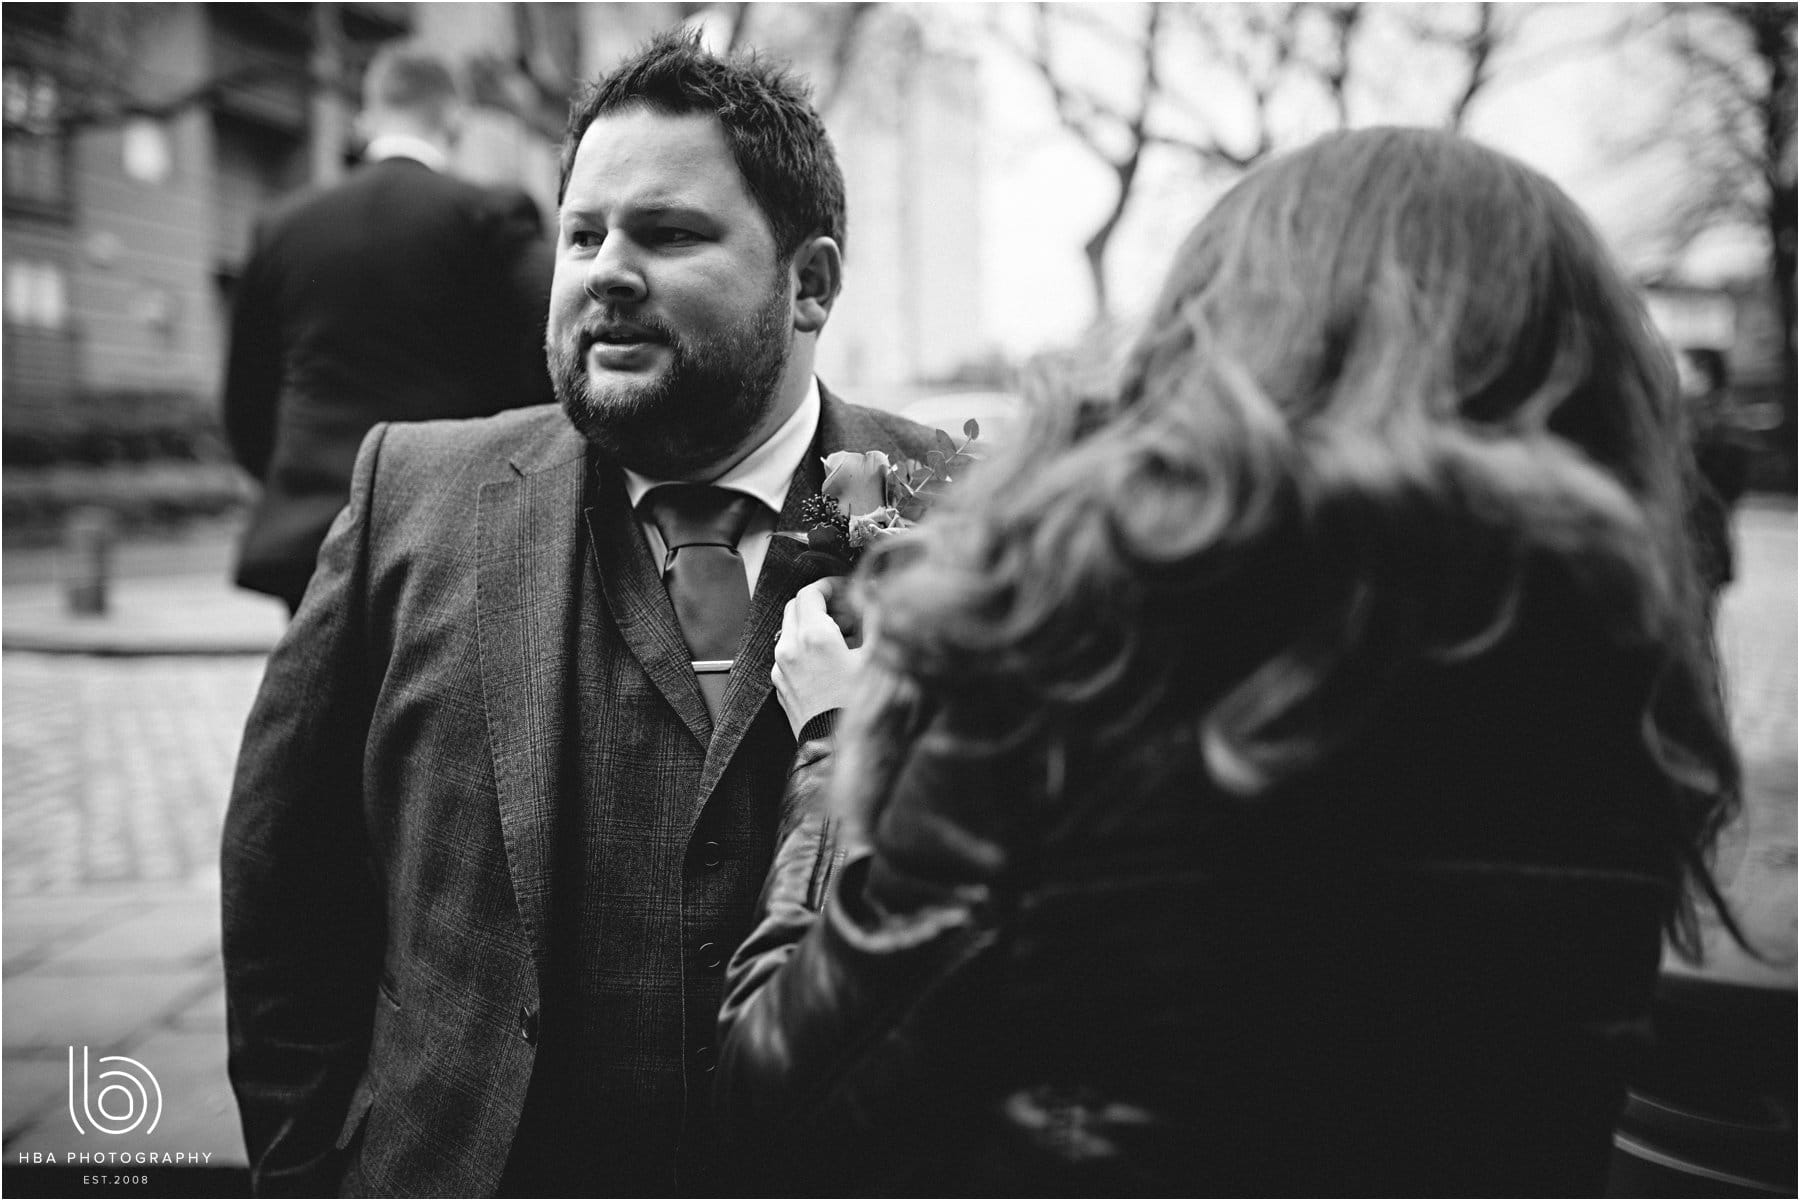 the groom outside